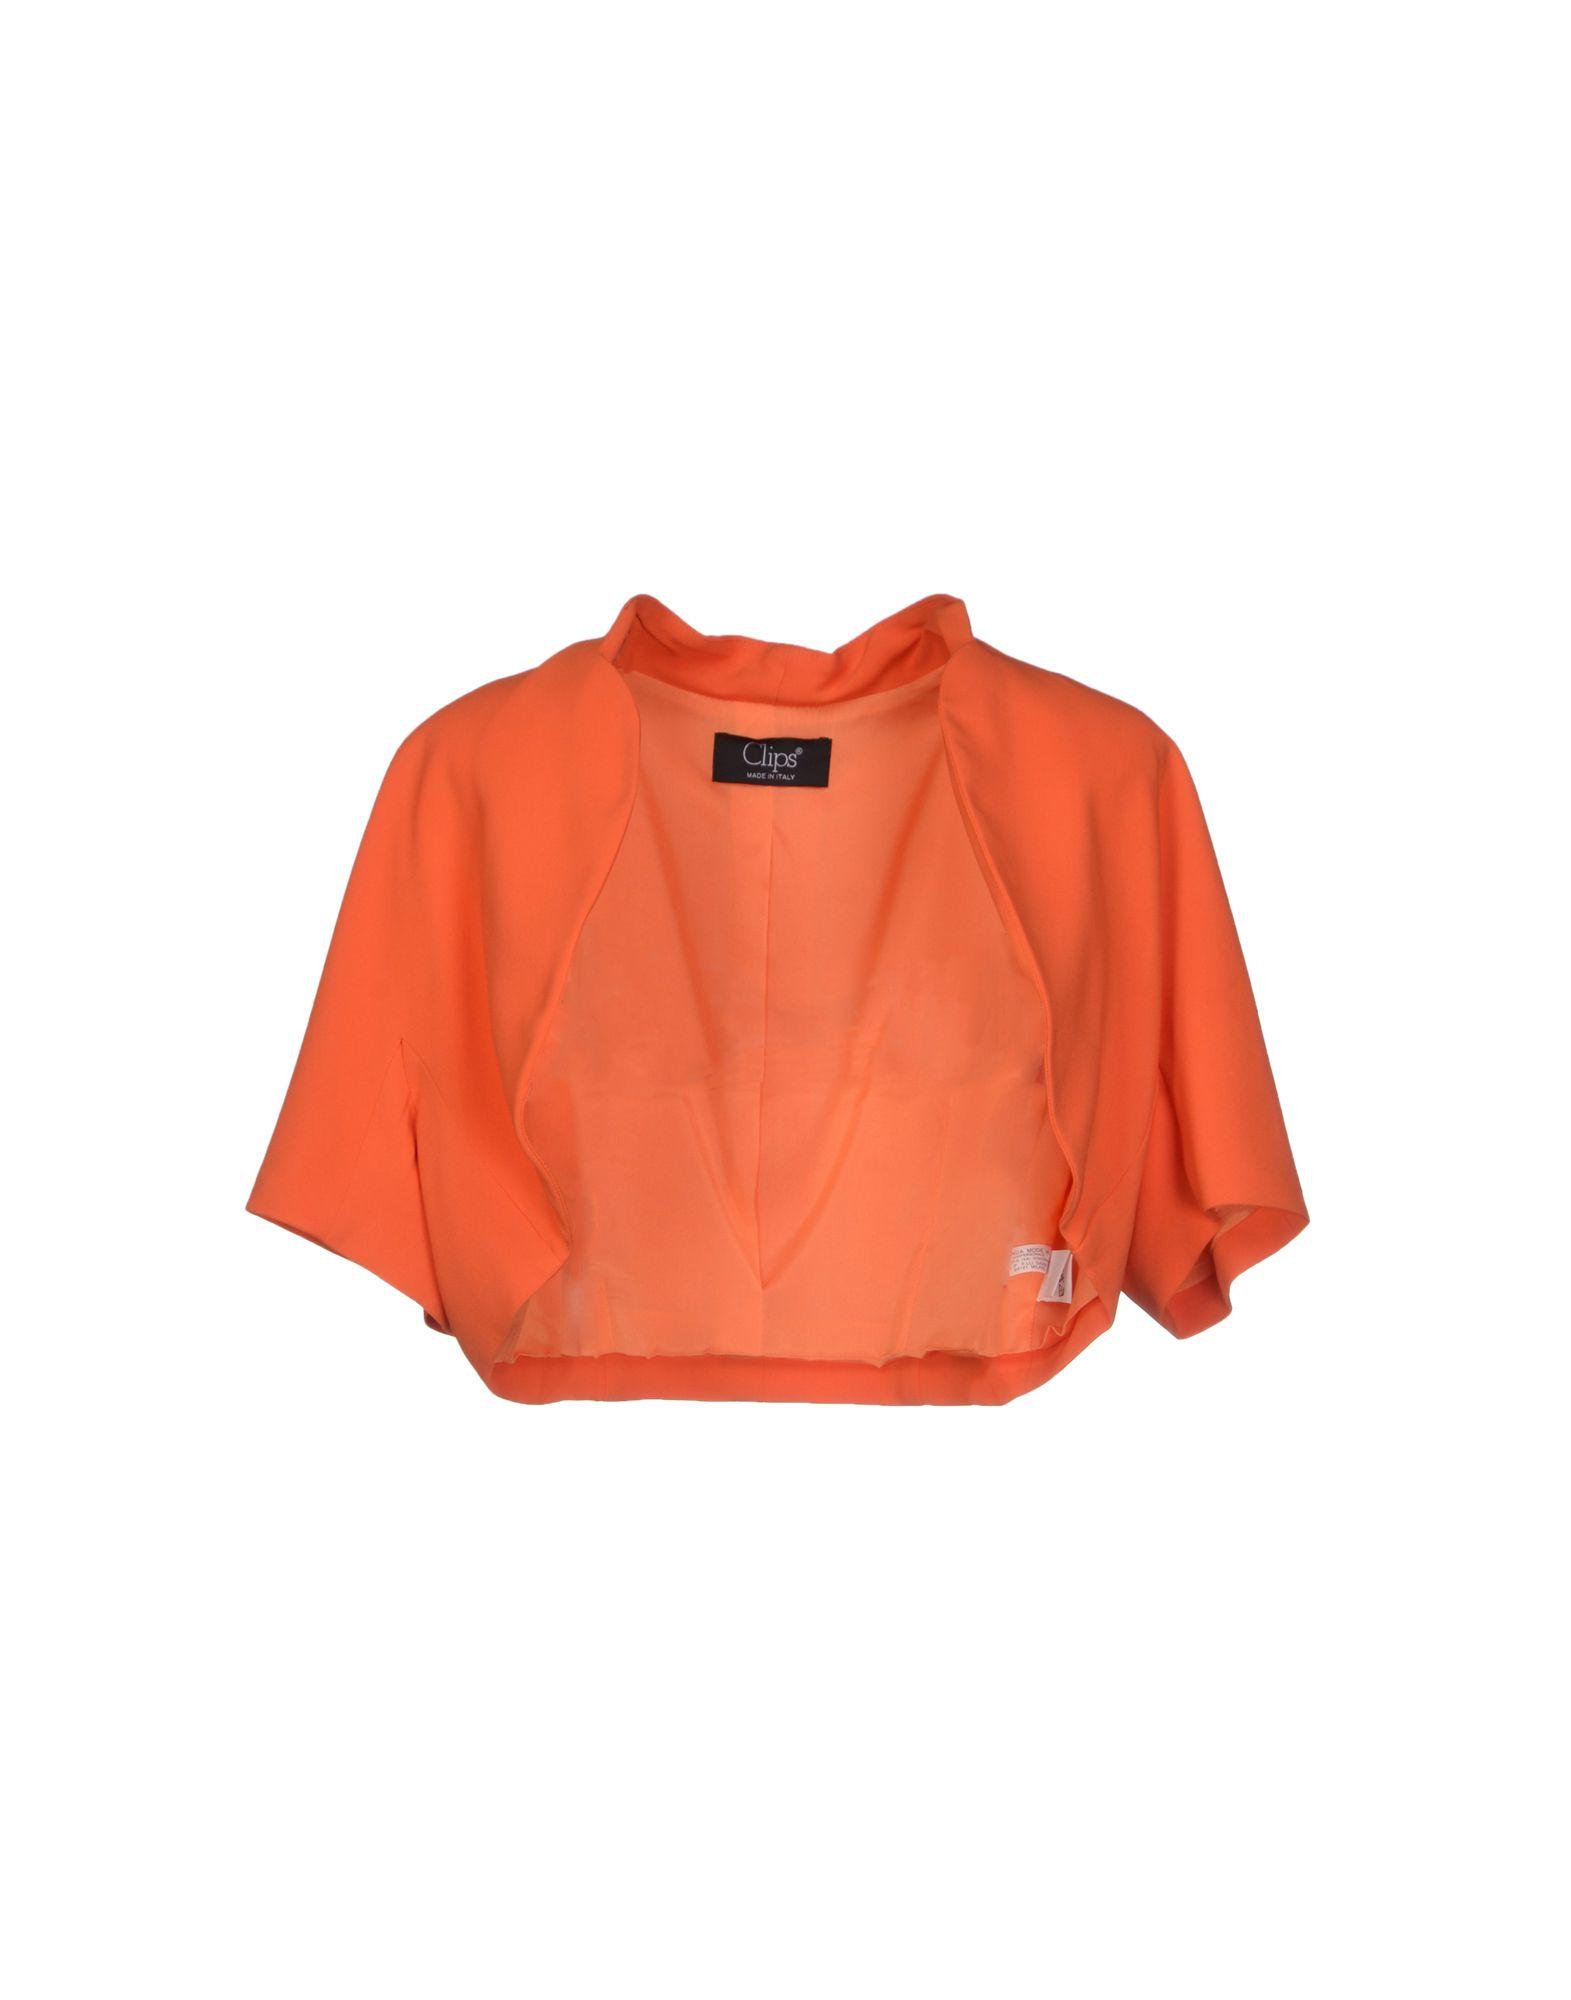 CLIPS Damen Bolero Farbe Orange Größe 4